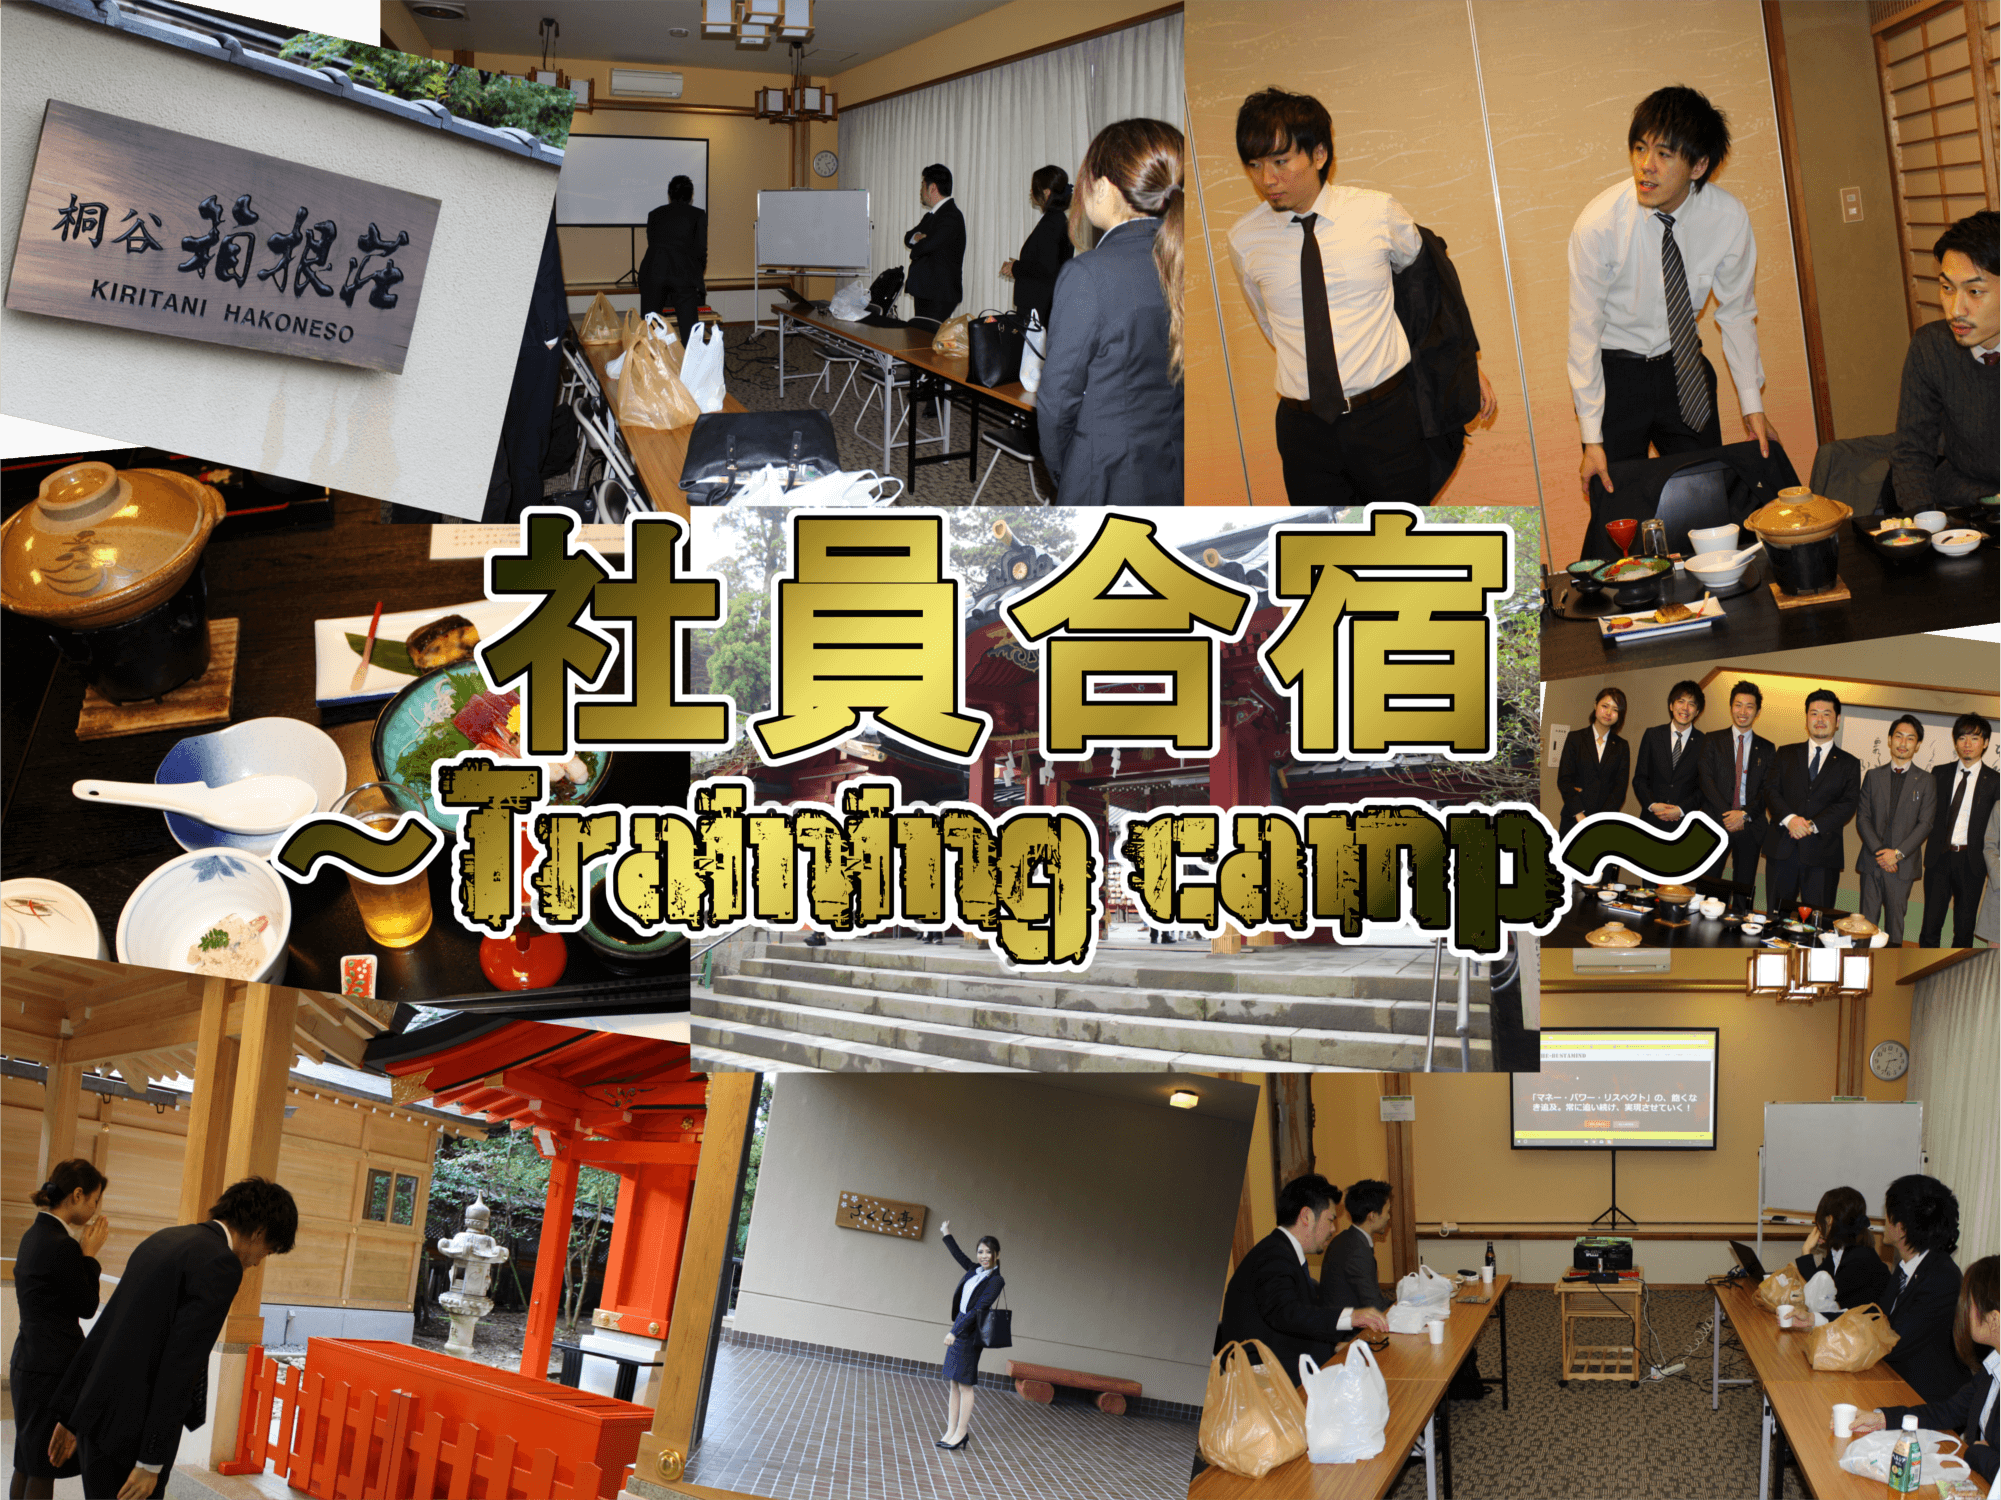 社員合宿~Training camp~